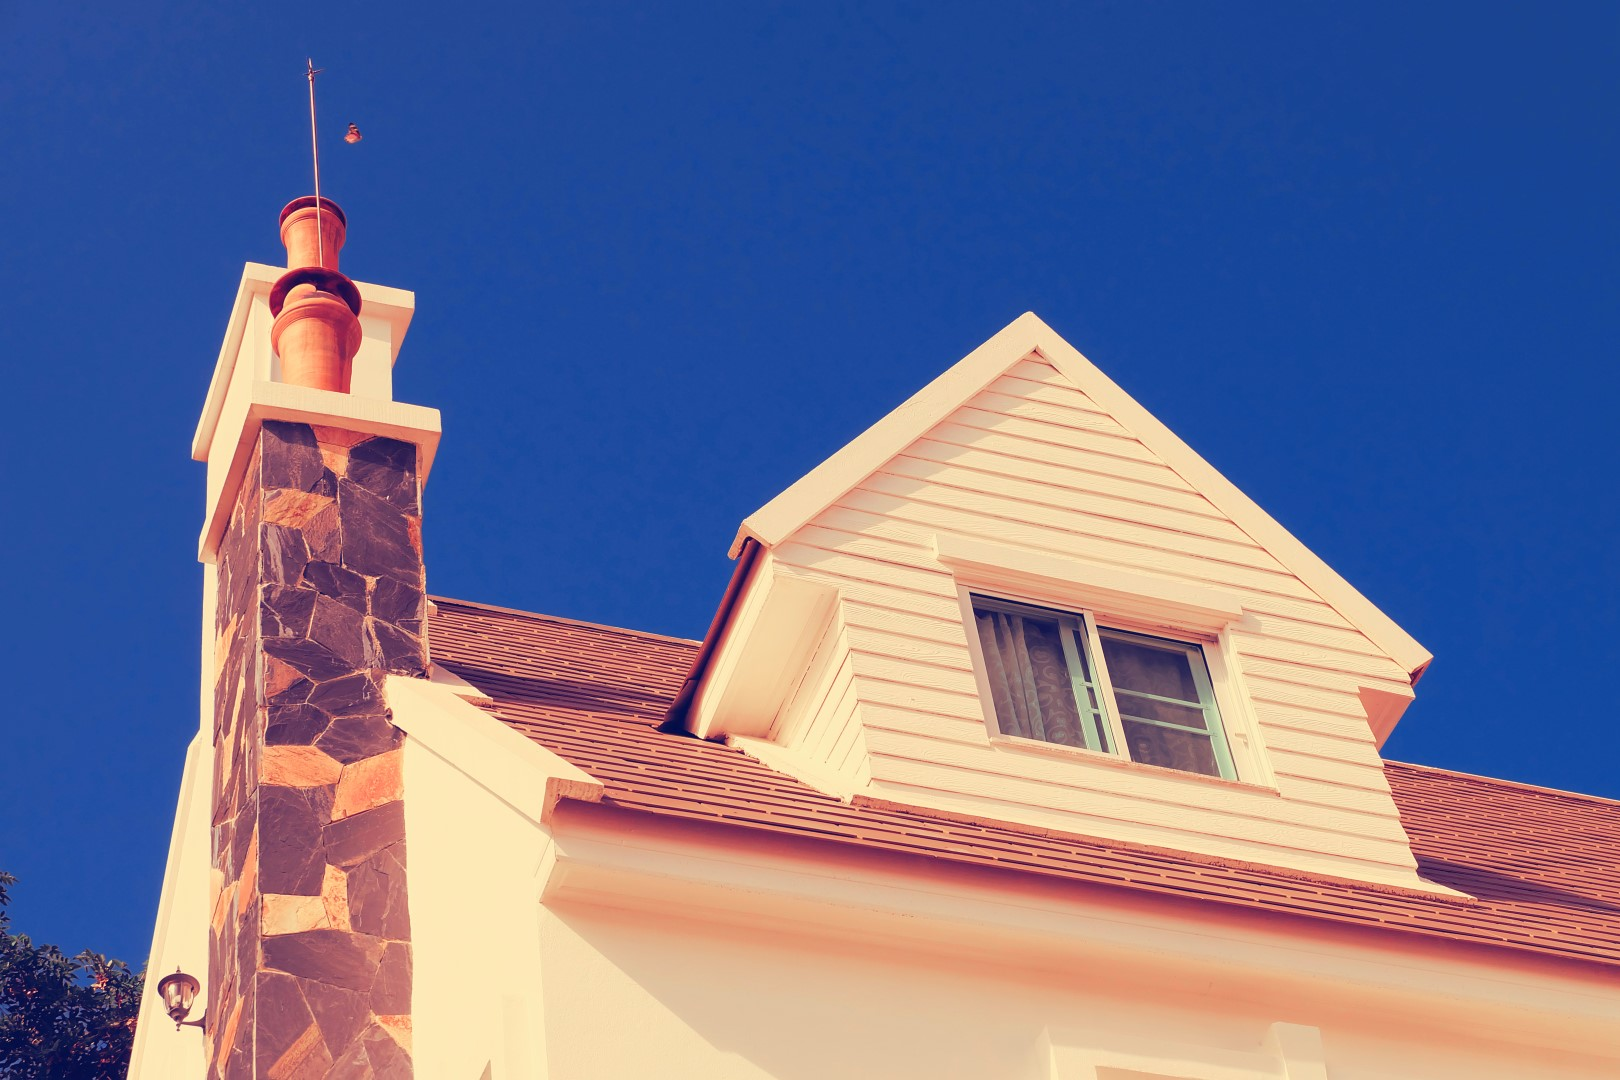 home-busileding-construction-Large.jpg